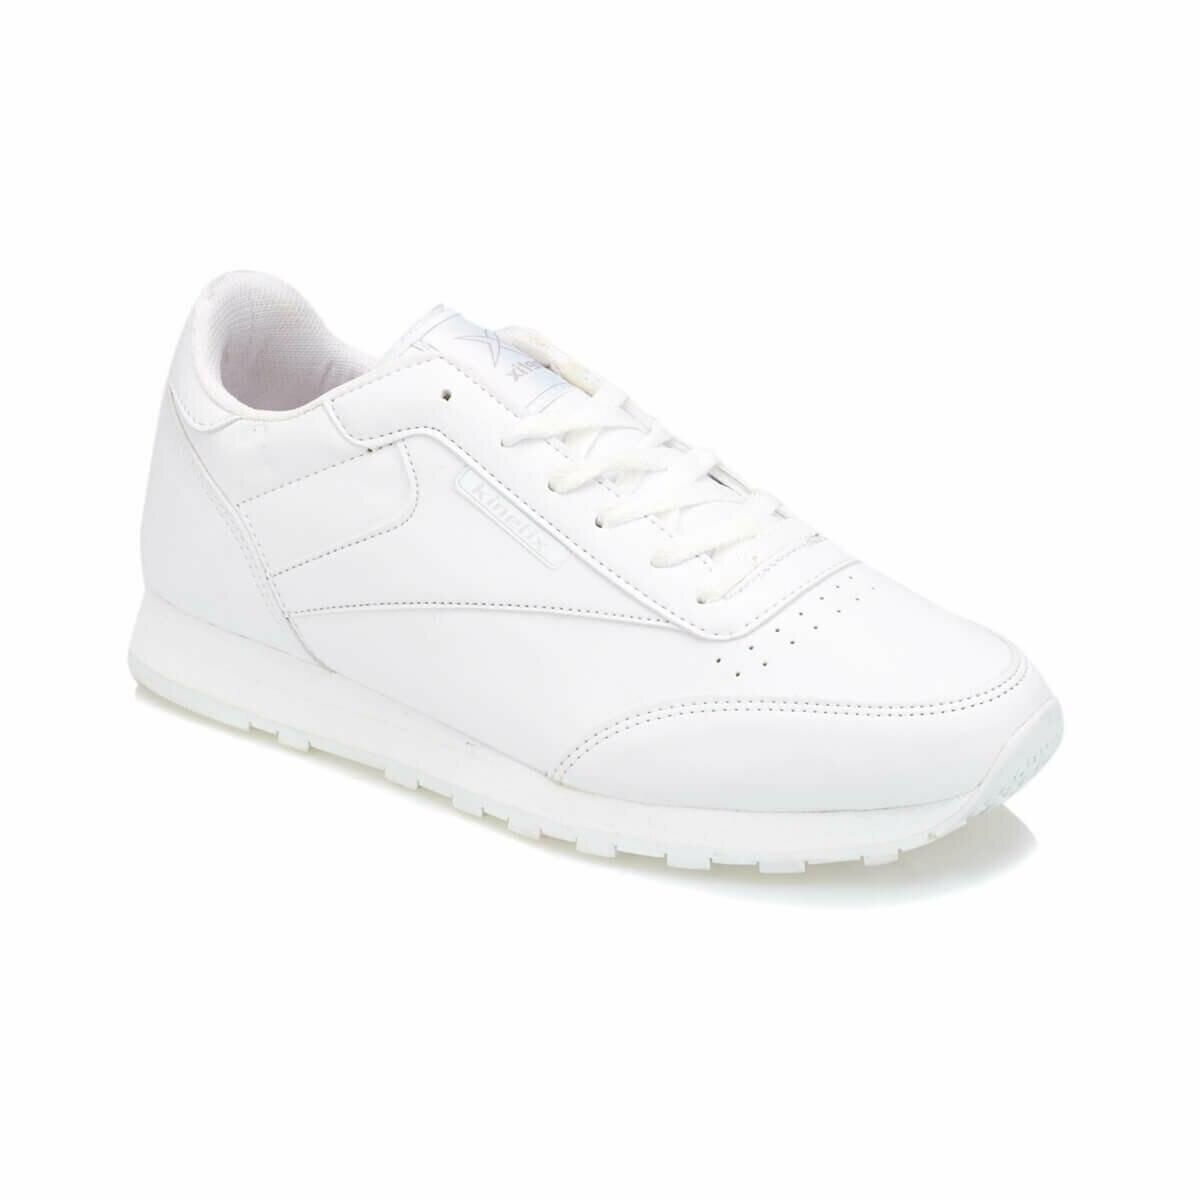 FLO LOWER PU M White Men 'S Sneaker Shoes KINETIX